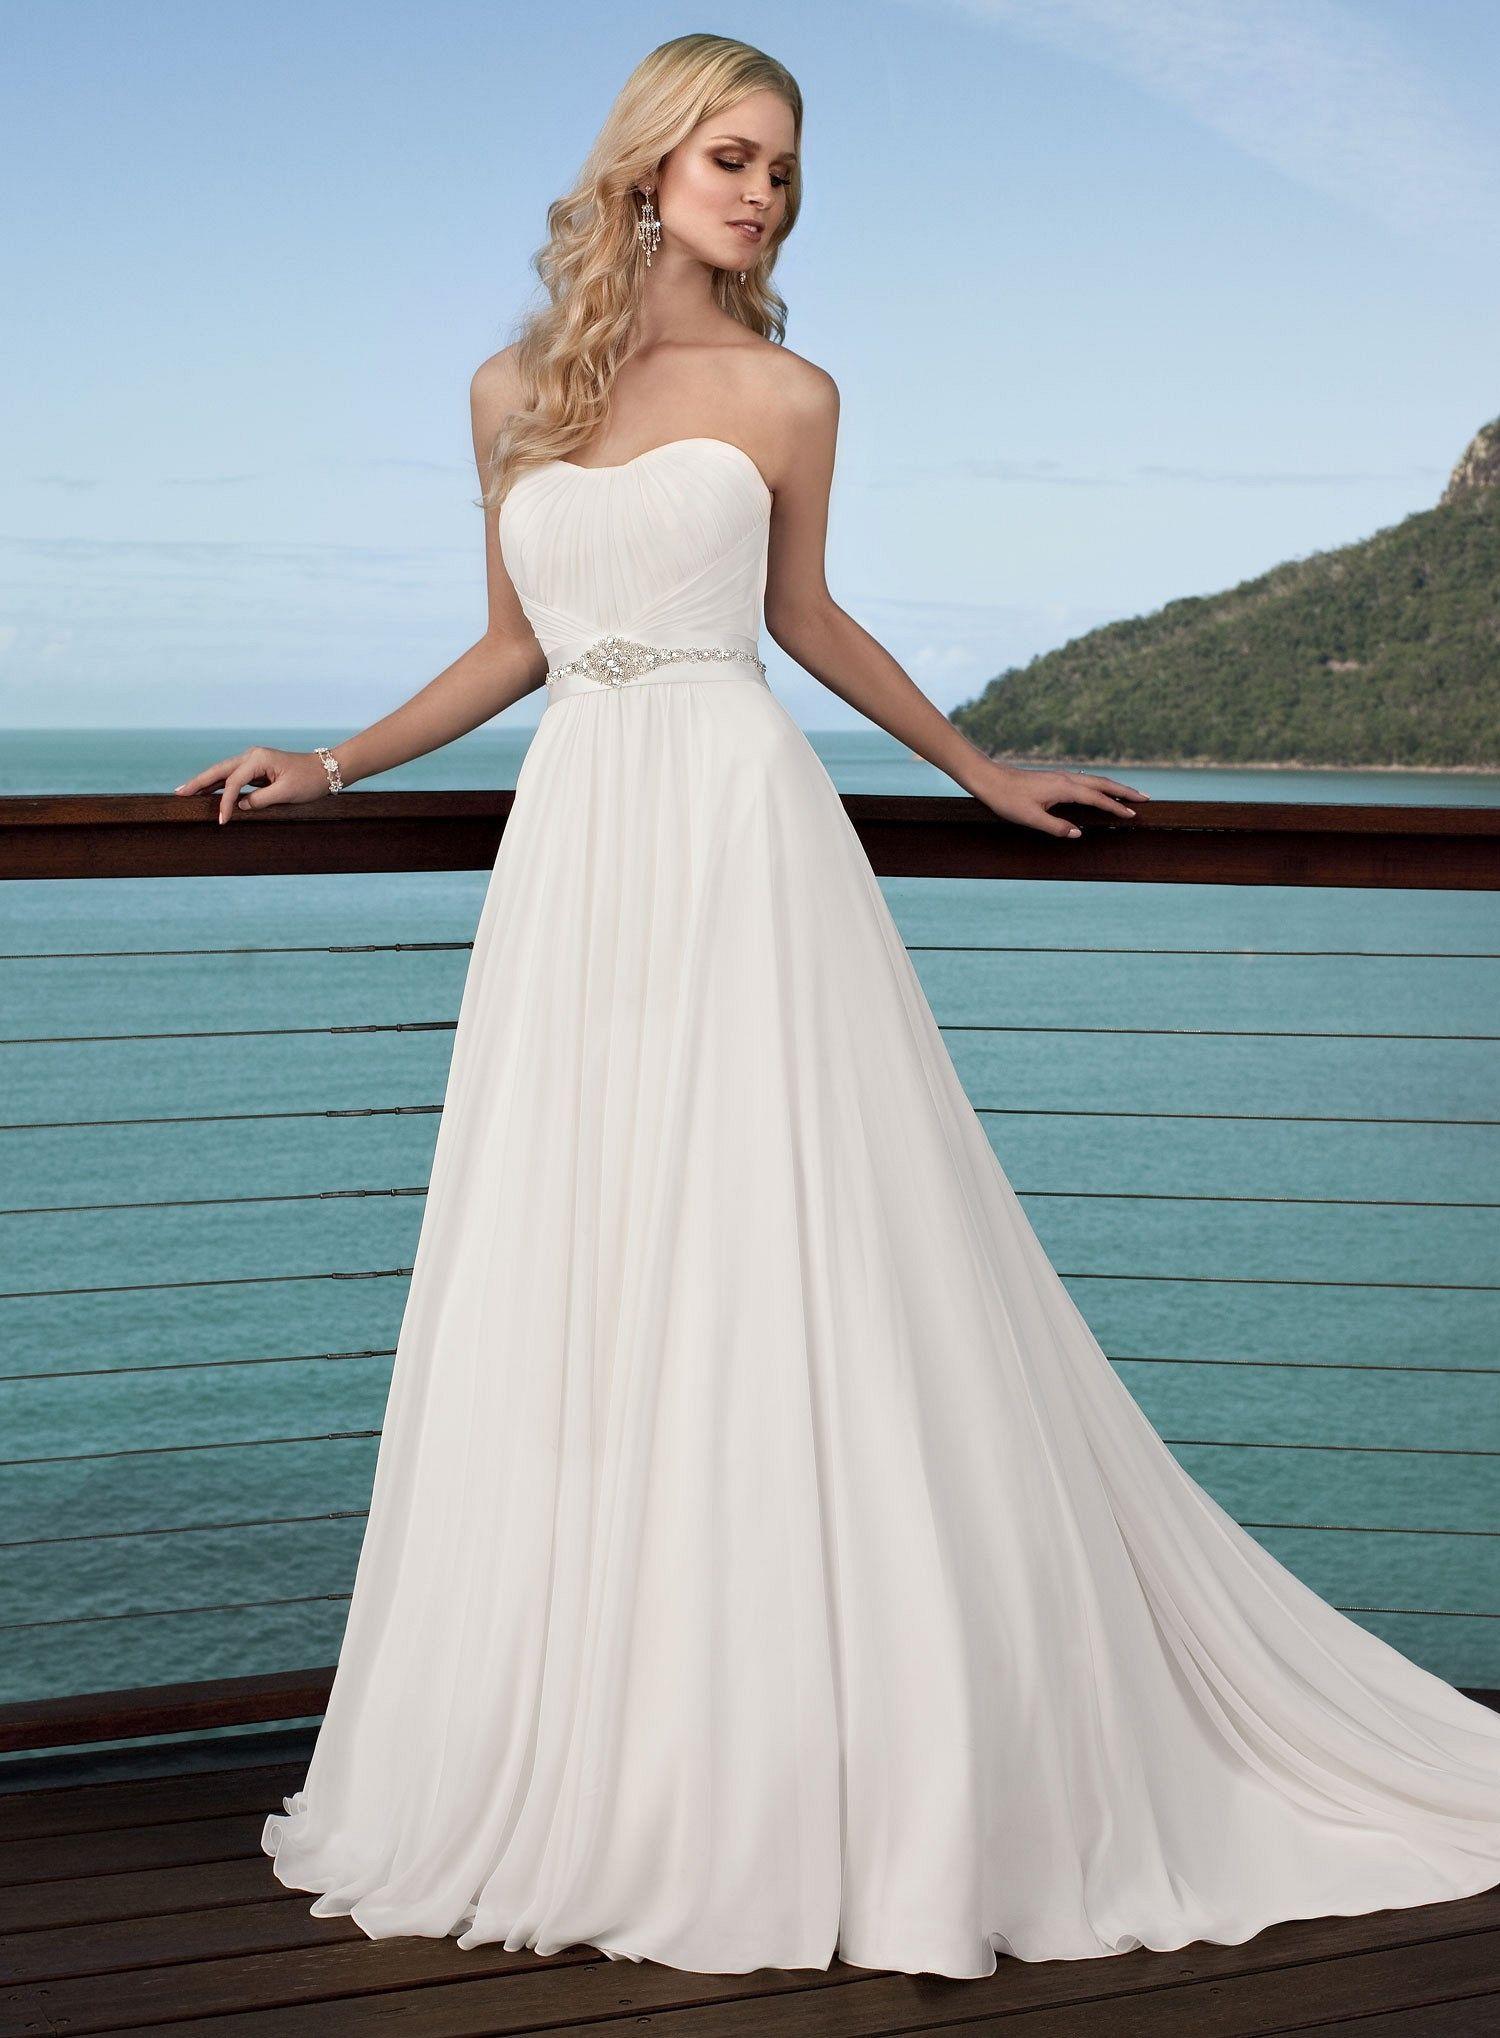 50+ Exotic Beach Wedding Dresses That Inspire | Brides | Pinterest ...